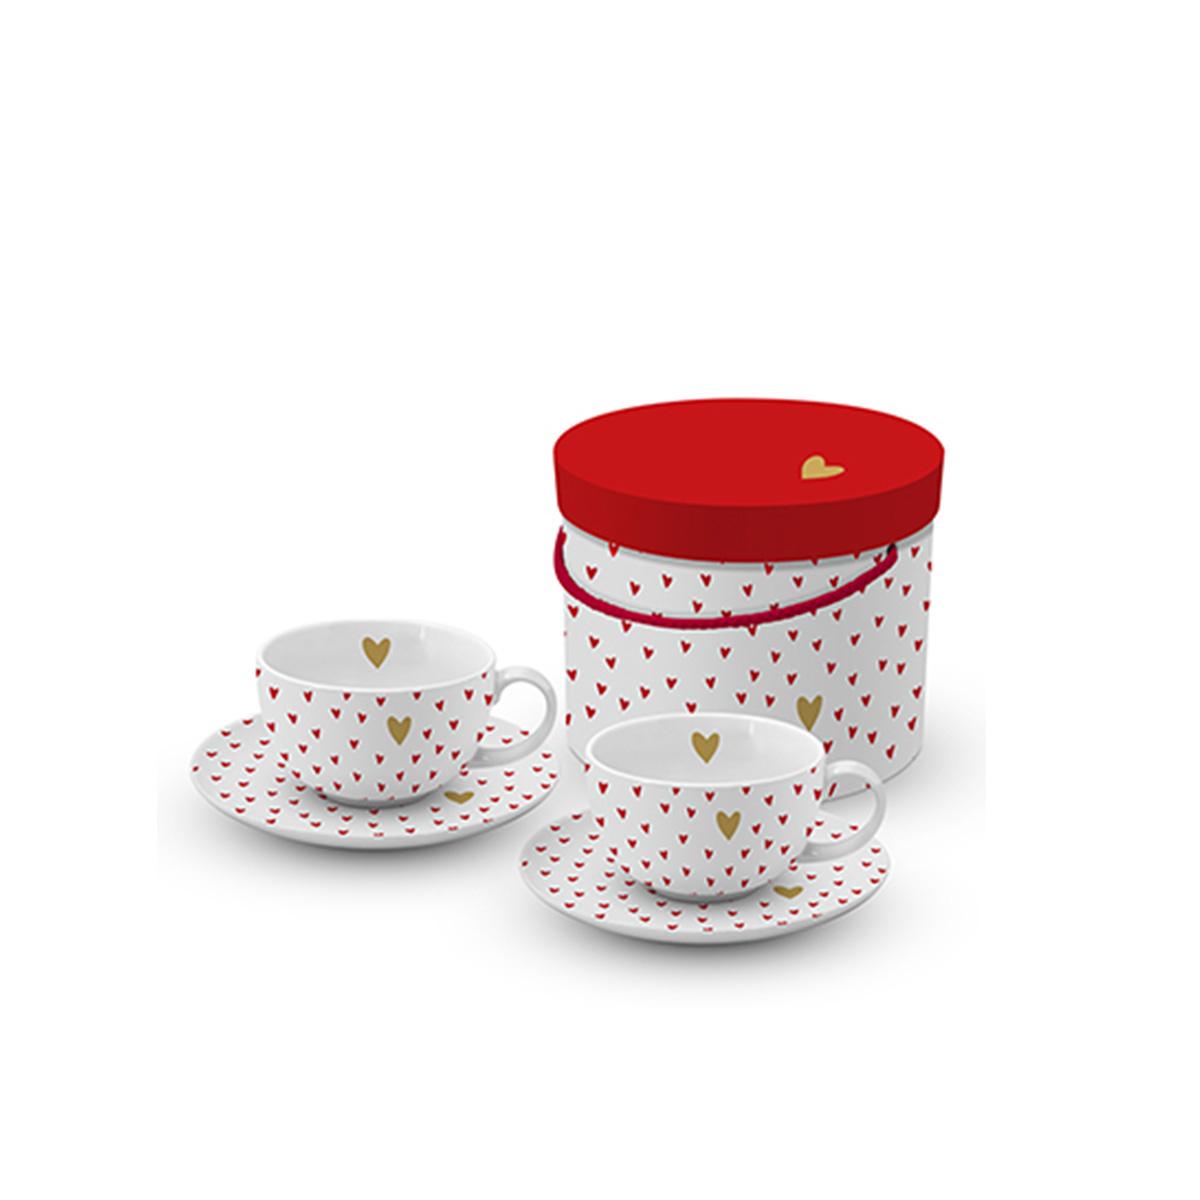 Šolja za cappuccino Little Heart 603601